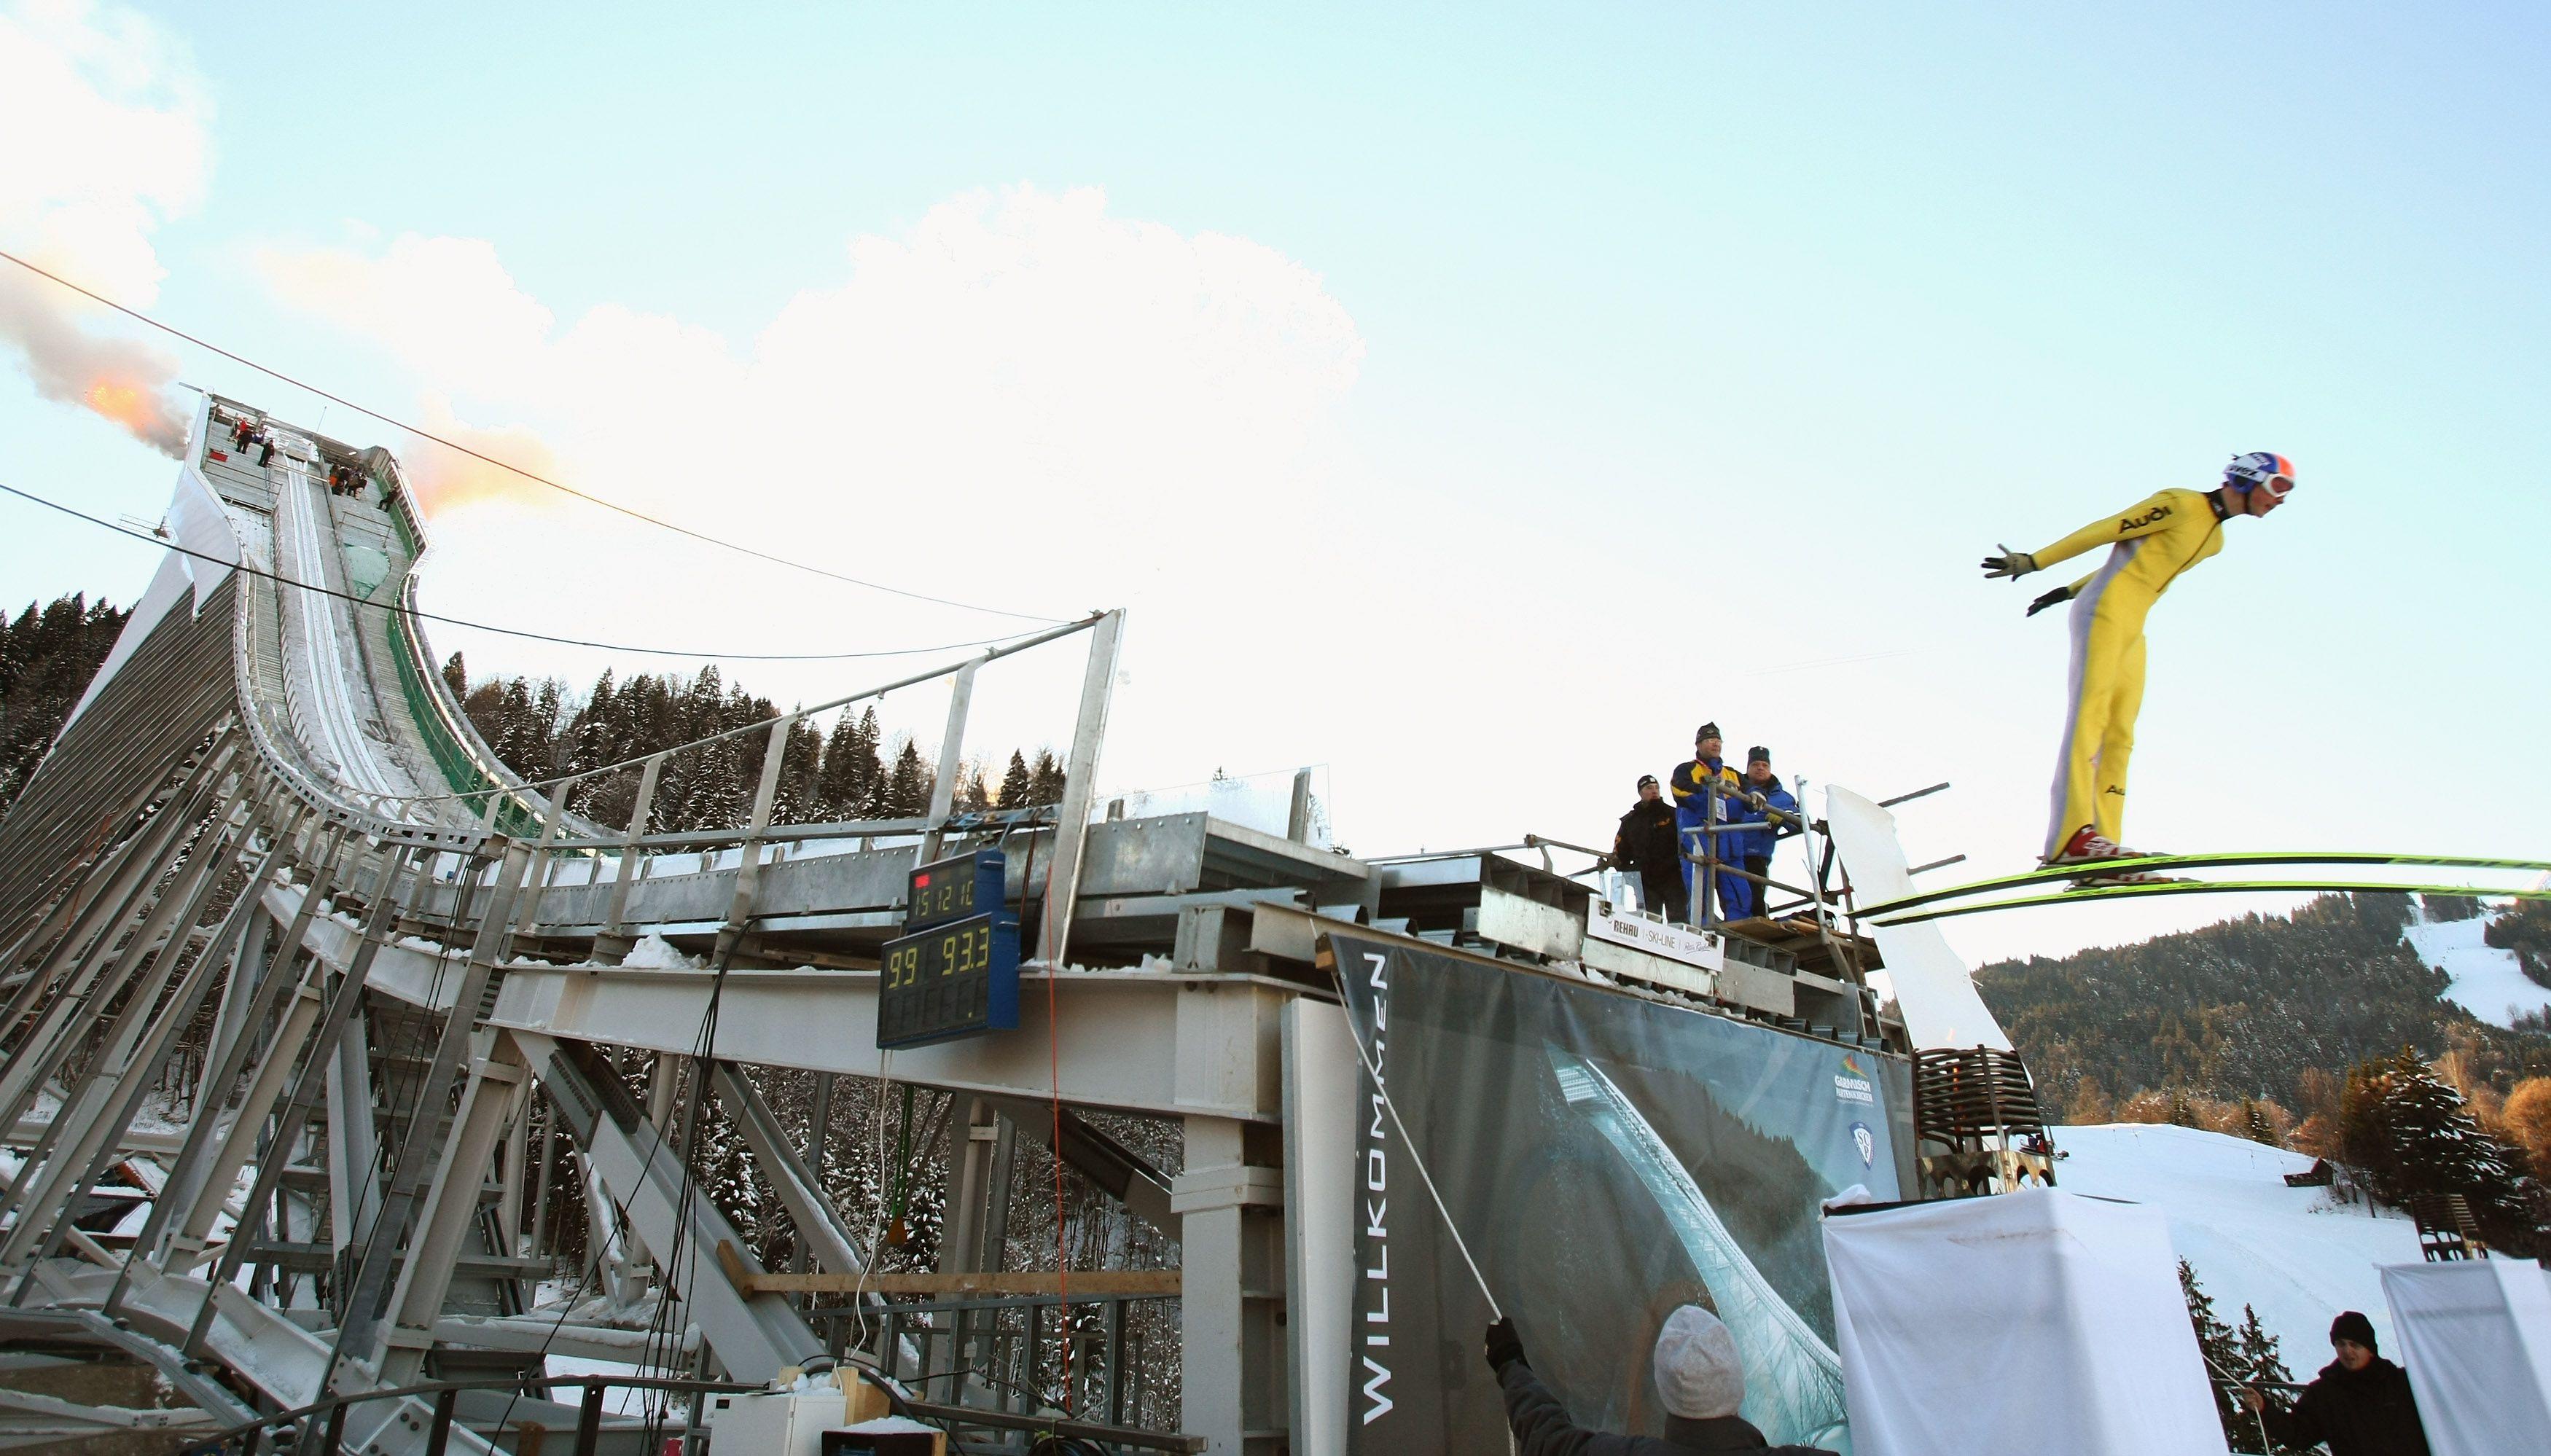 Olympic Ski Jump Garmisch-Partenkirchen